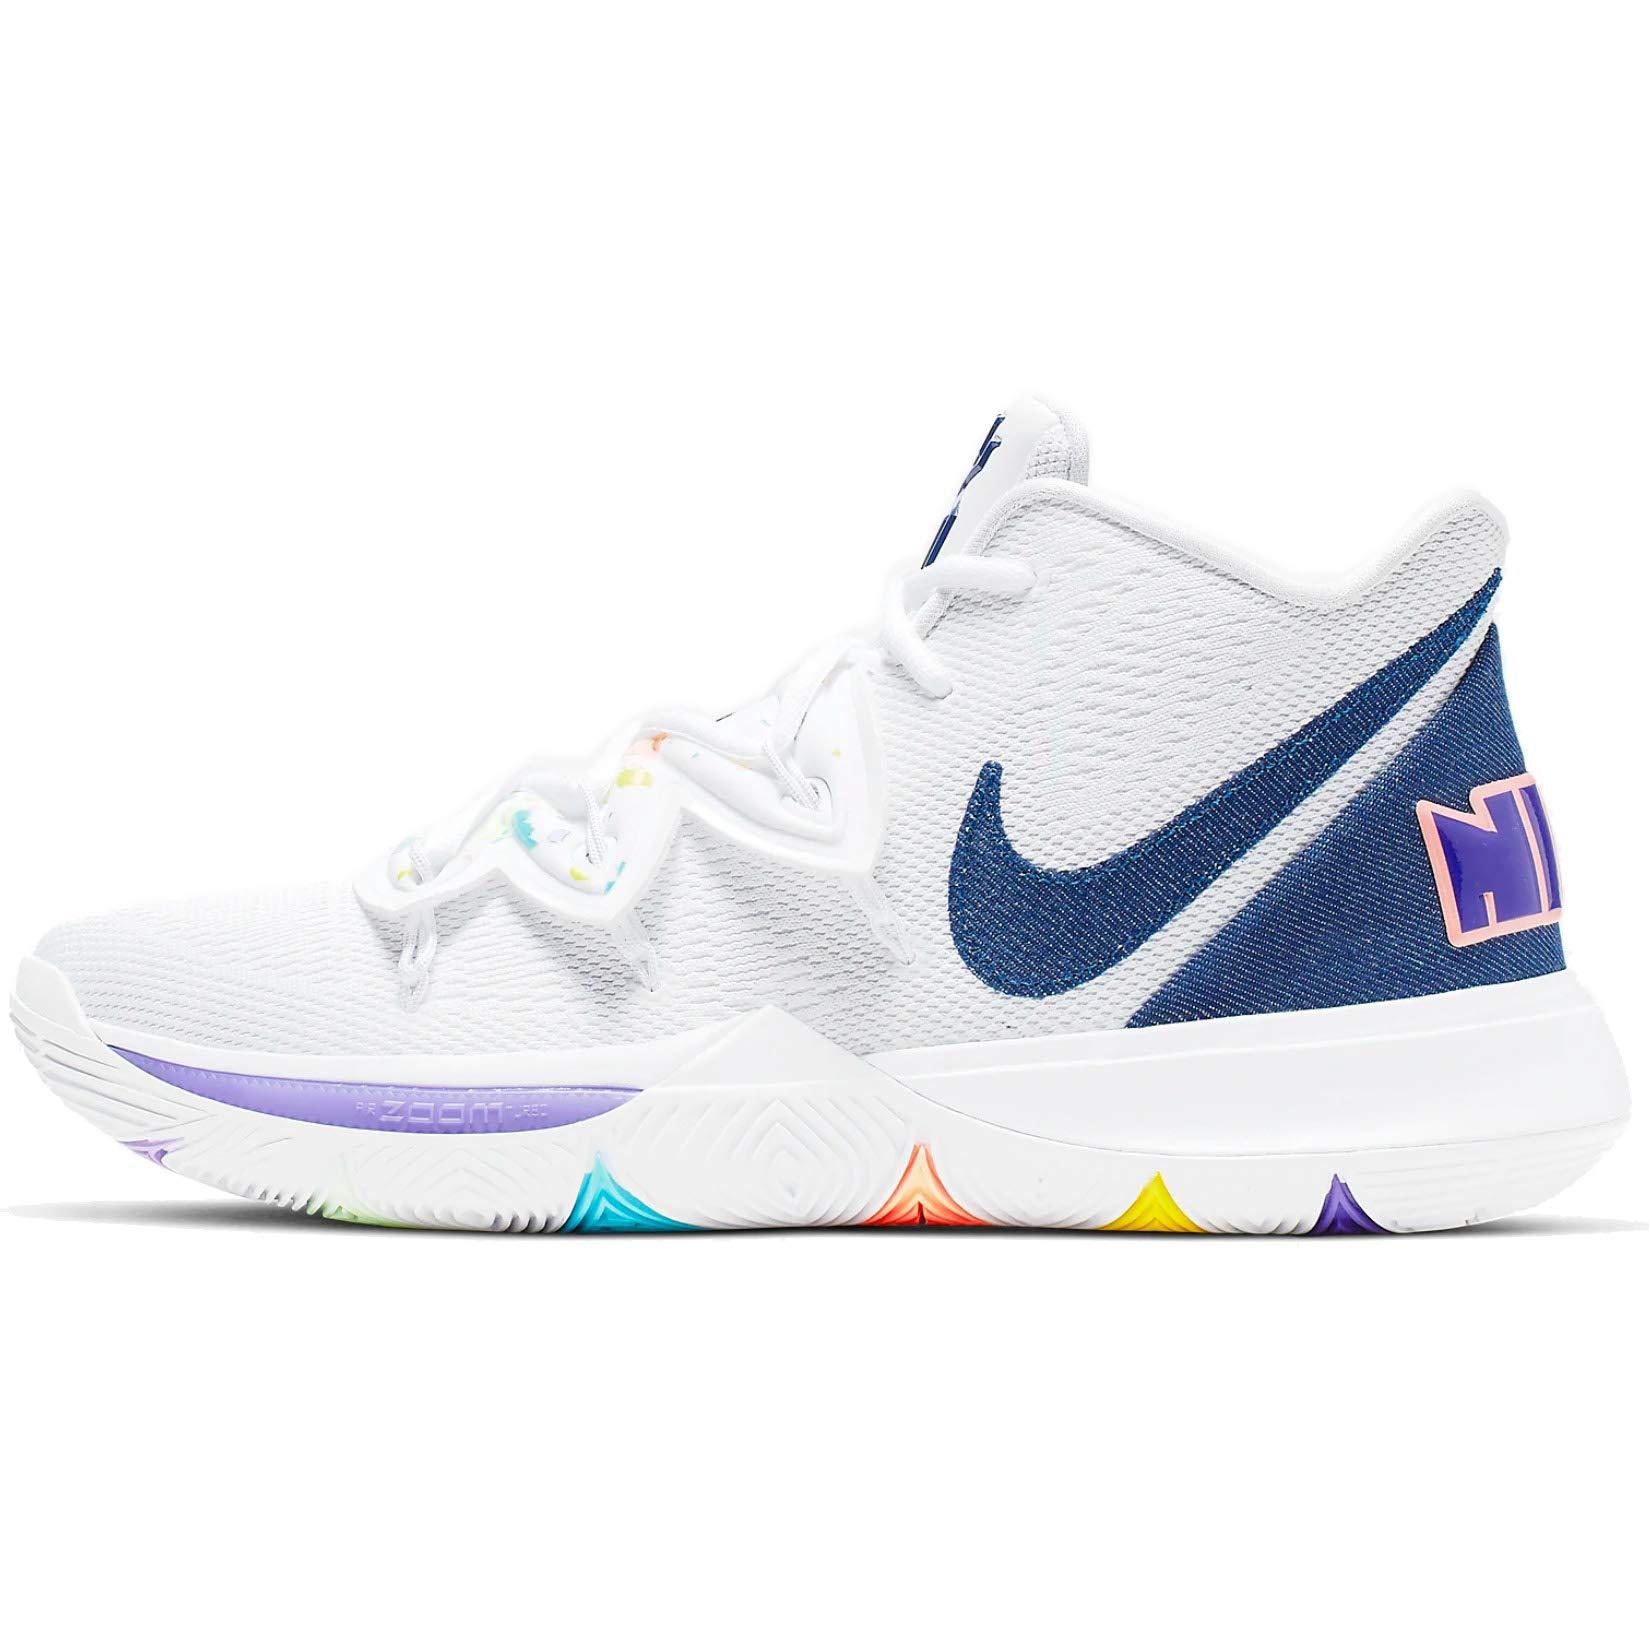 gs Nike Kyrie 5 Big Kids Aq2456-001